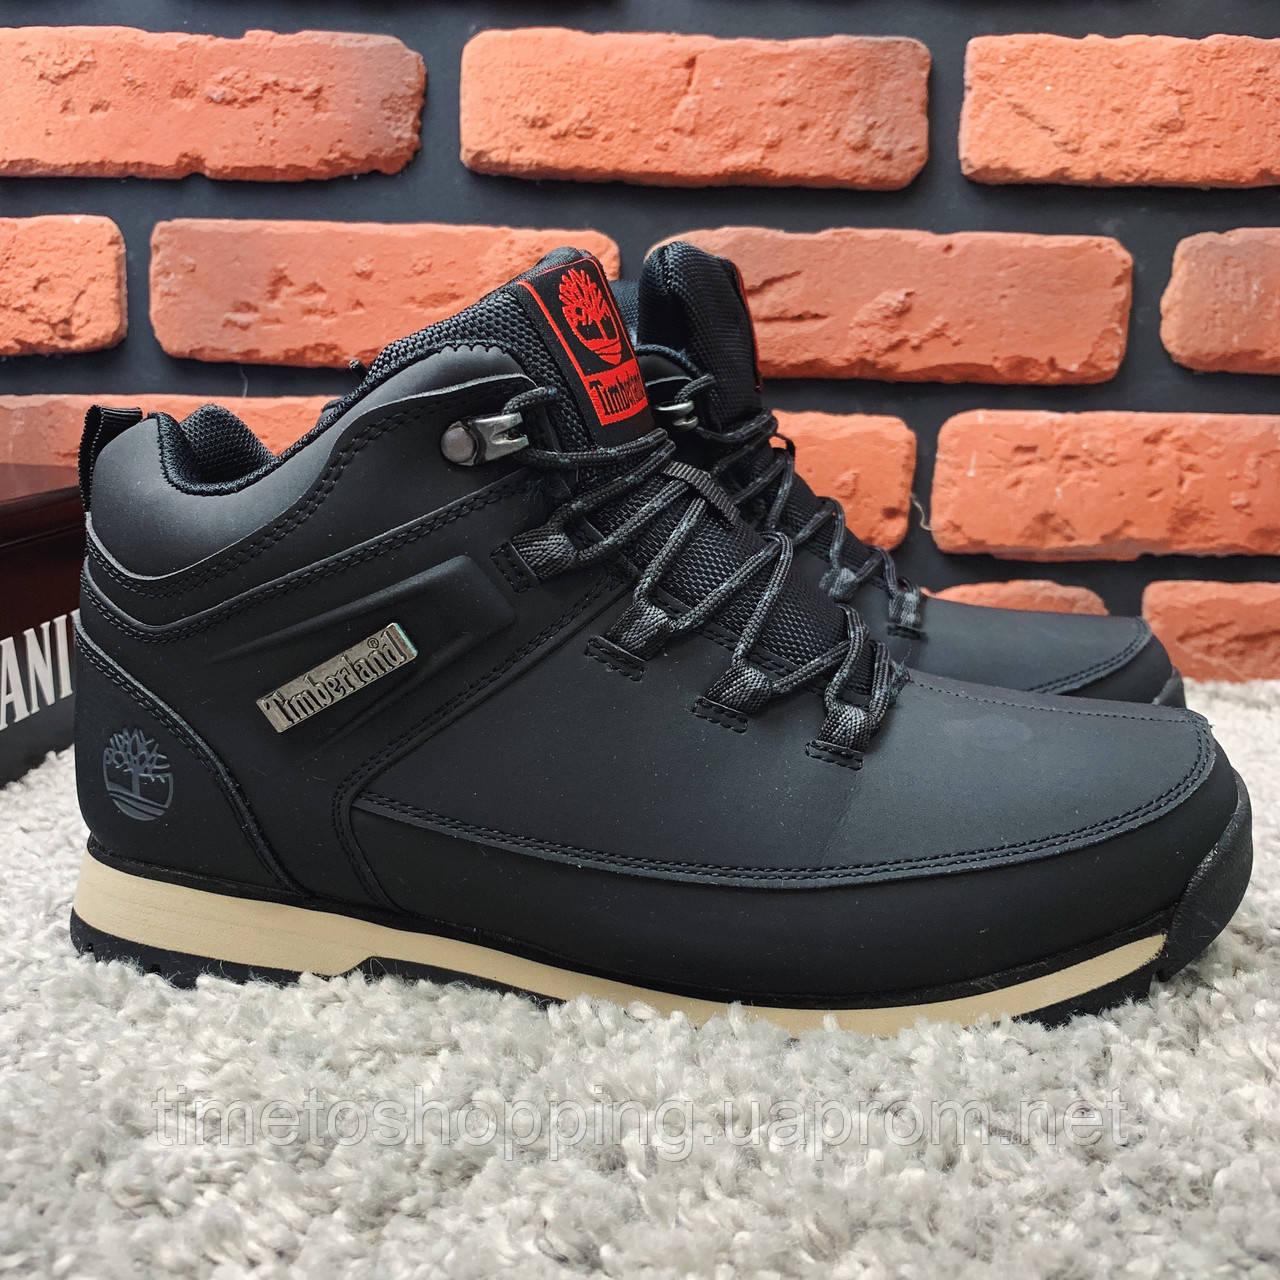 Зимние ботинки (на меху) мужские Timberland  11-002 ⏩РАЗМЕР  [ 41,42,44 ]